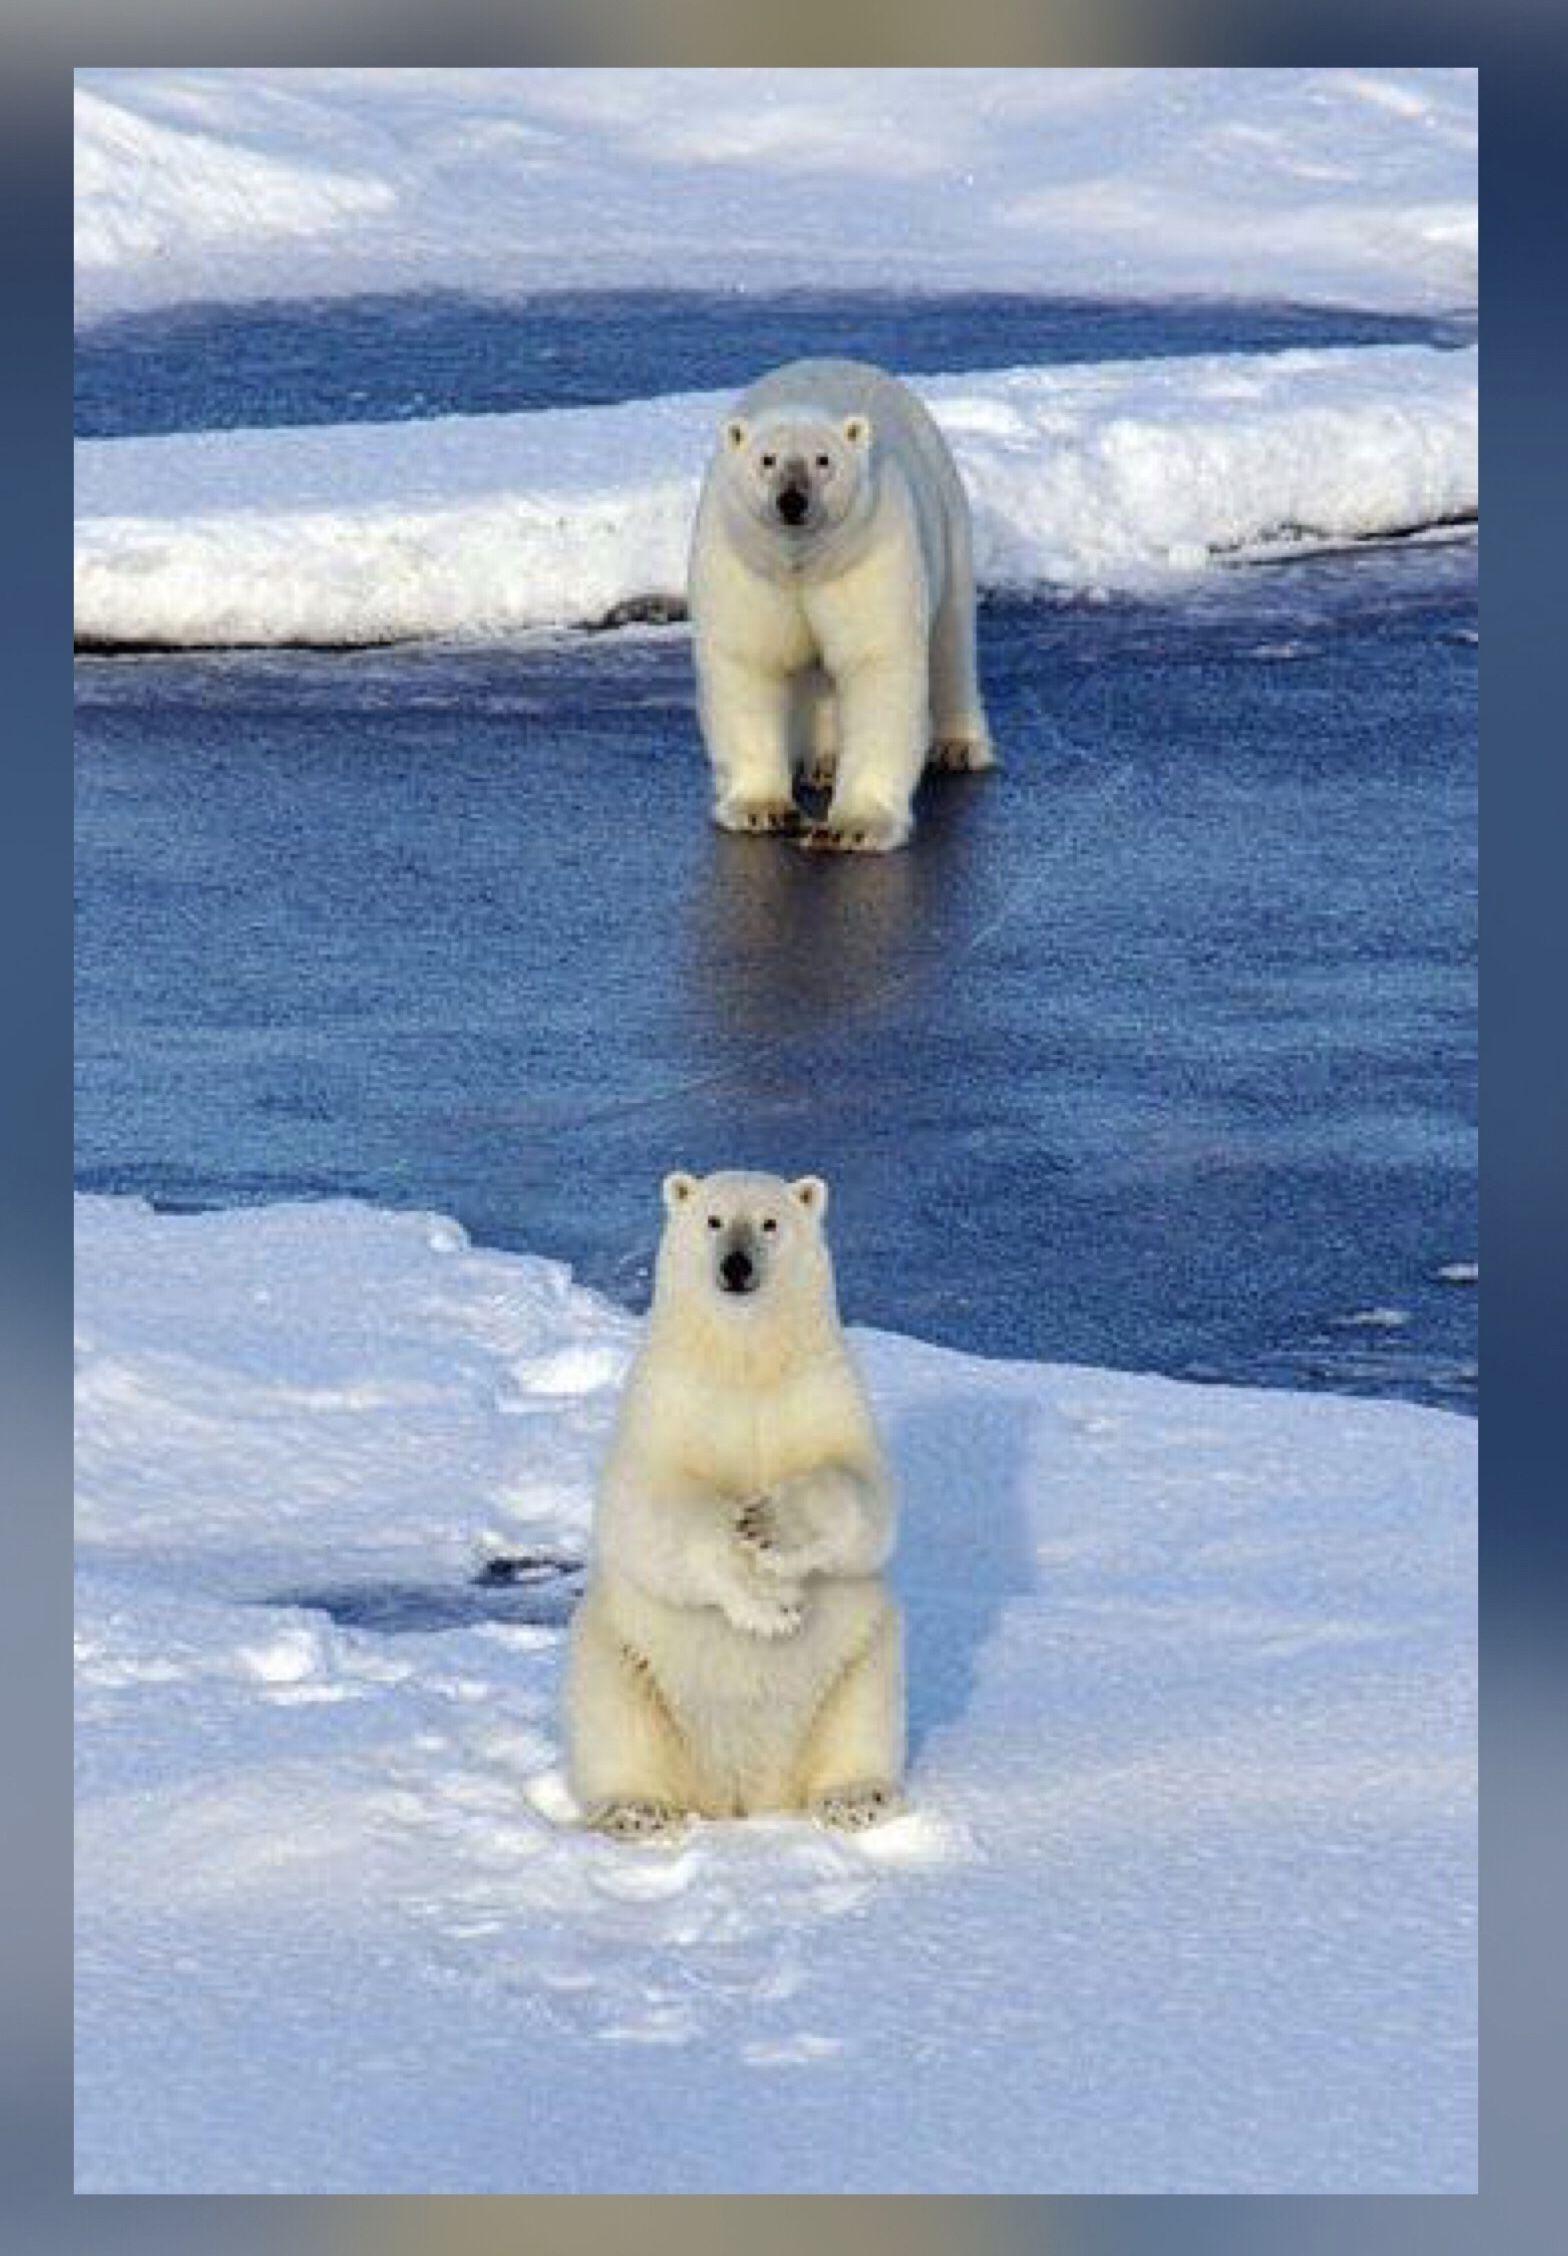 Pin by Kar3n.59 on Jehovah's Awesome Creation Polar bear